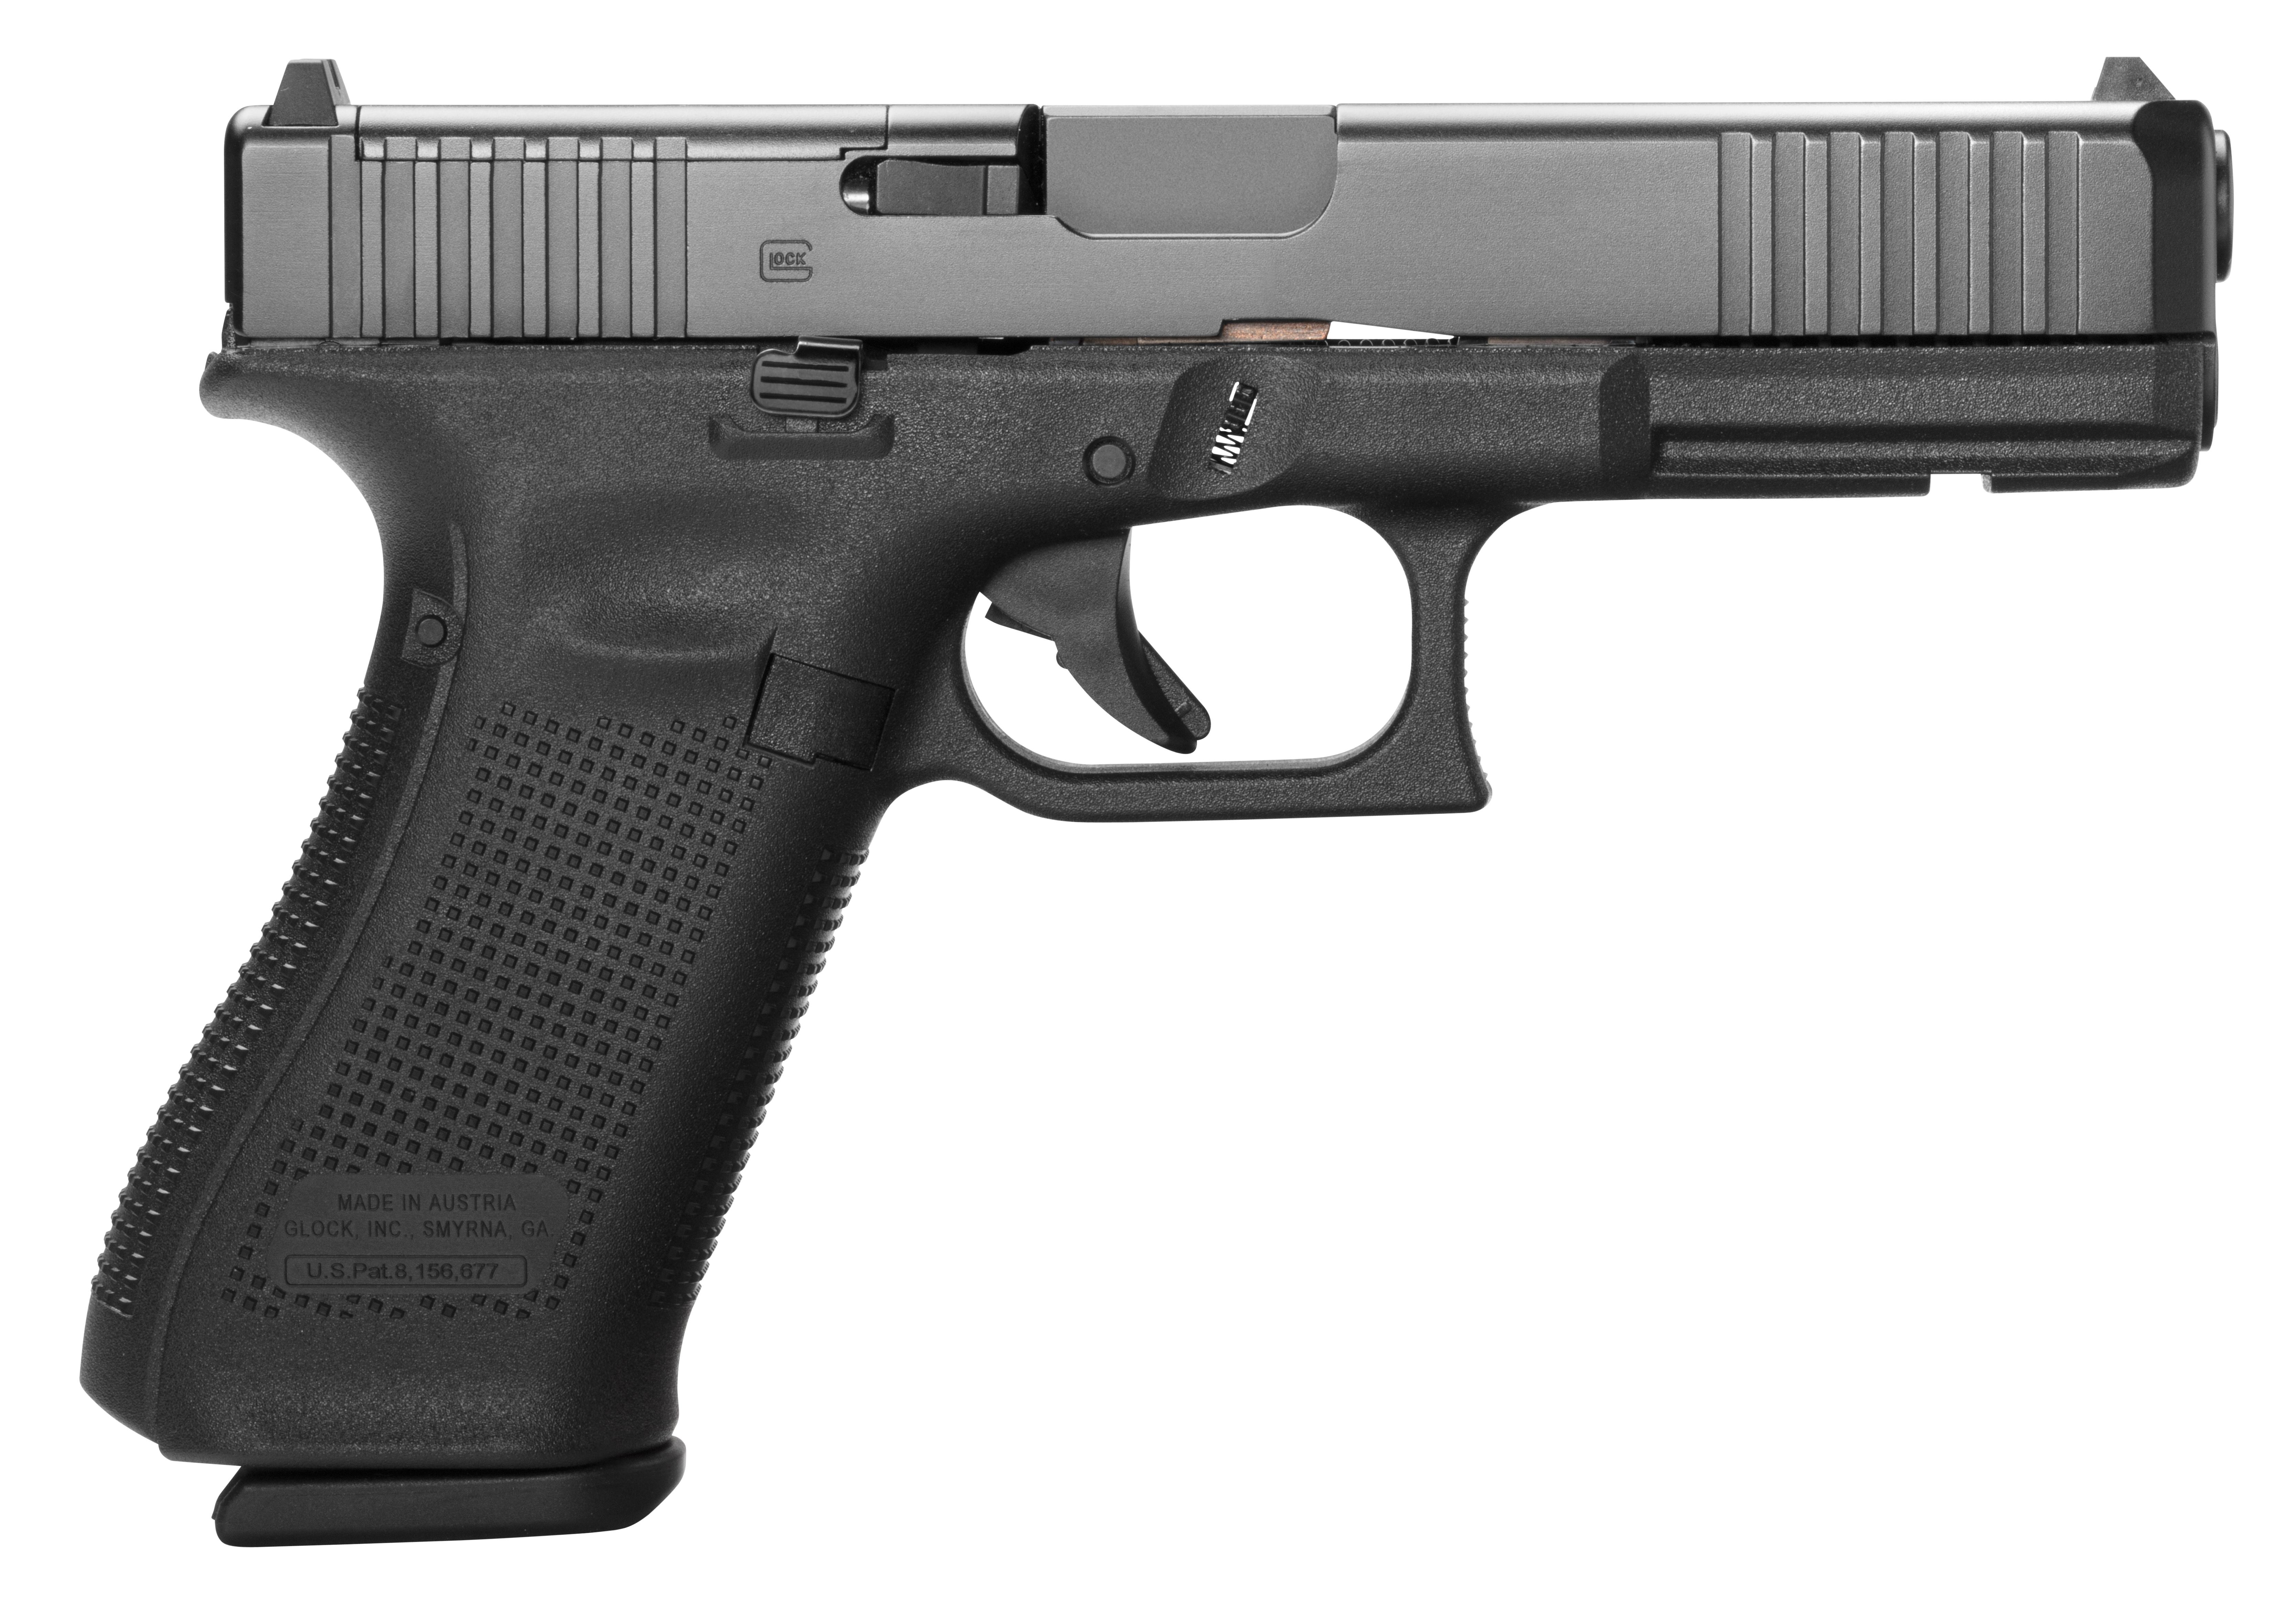 Glock 17 Gen 5 MOS 9mm - Black